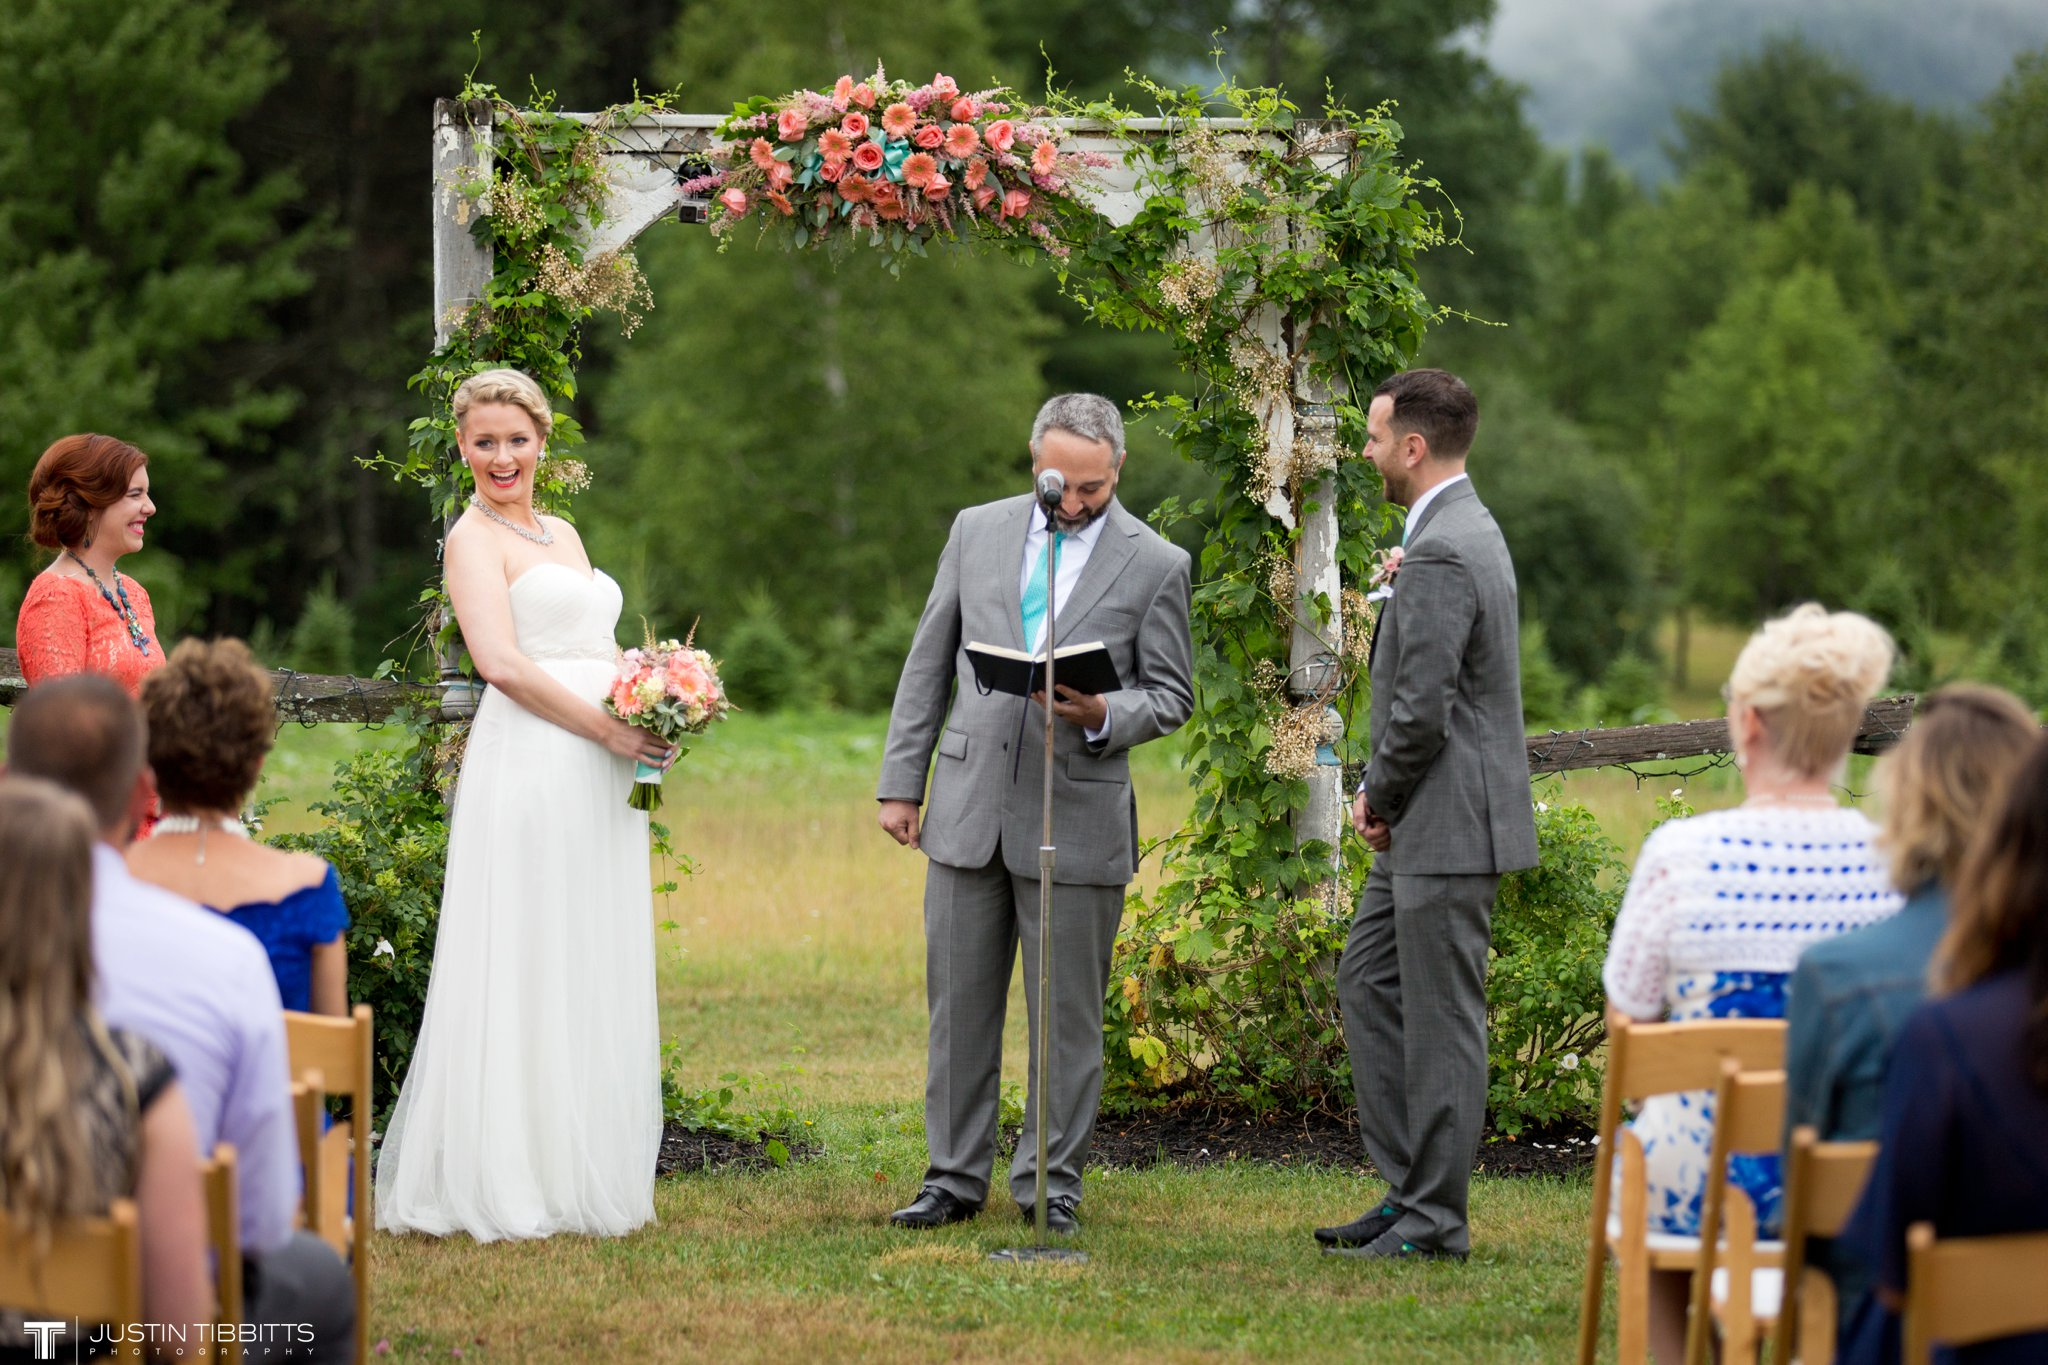 burlap-and-beams-wedding-photos-with-joran-and-molly_0058